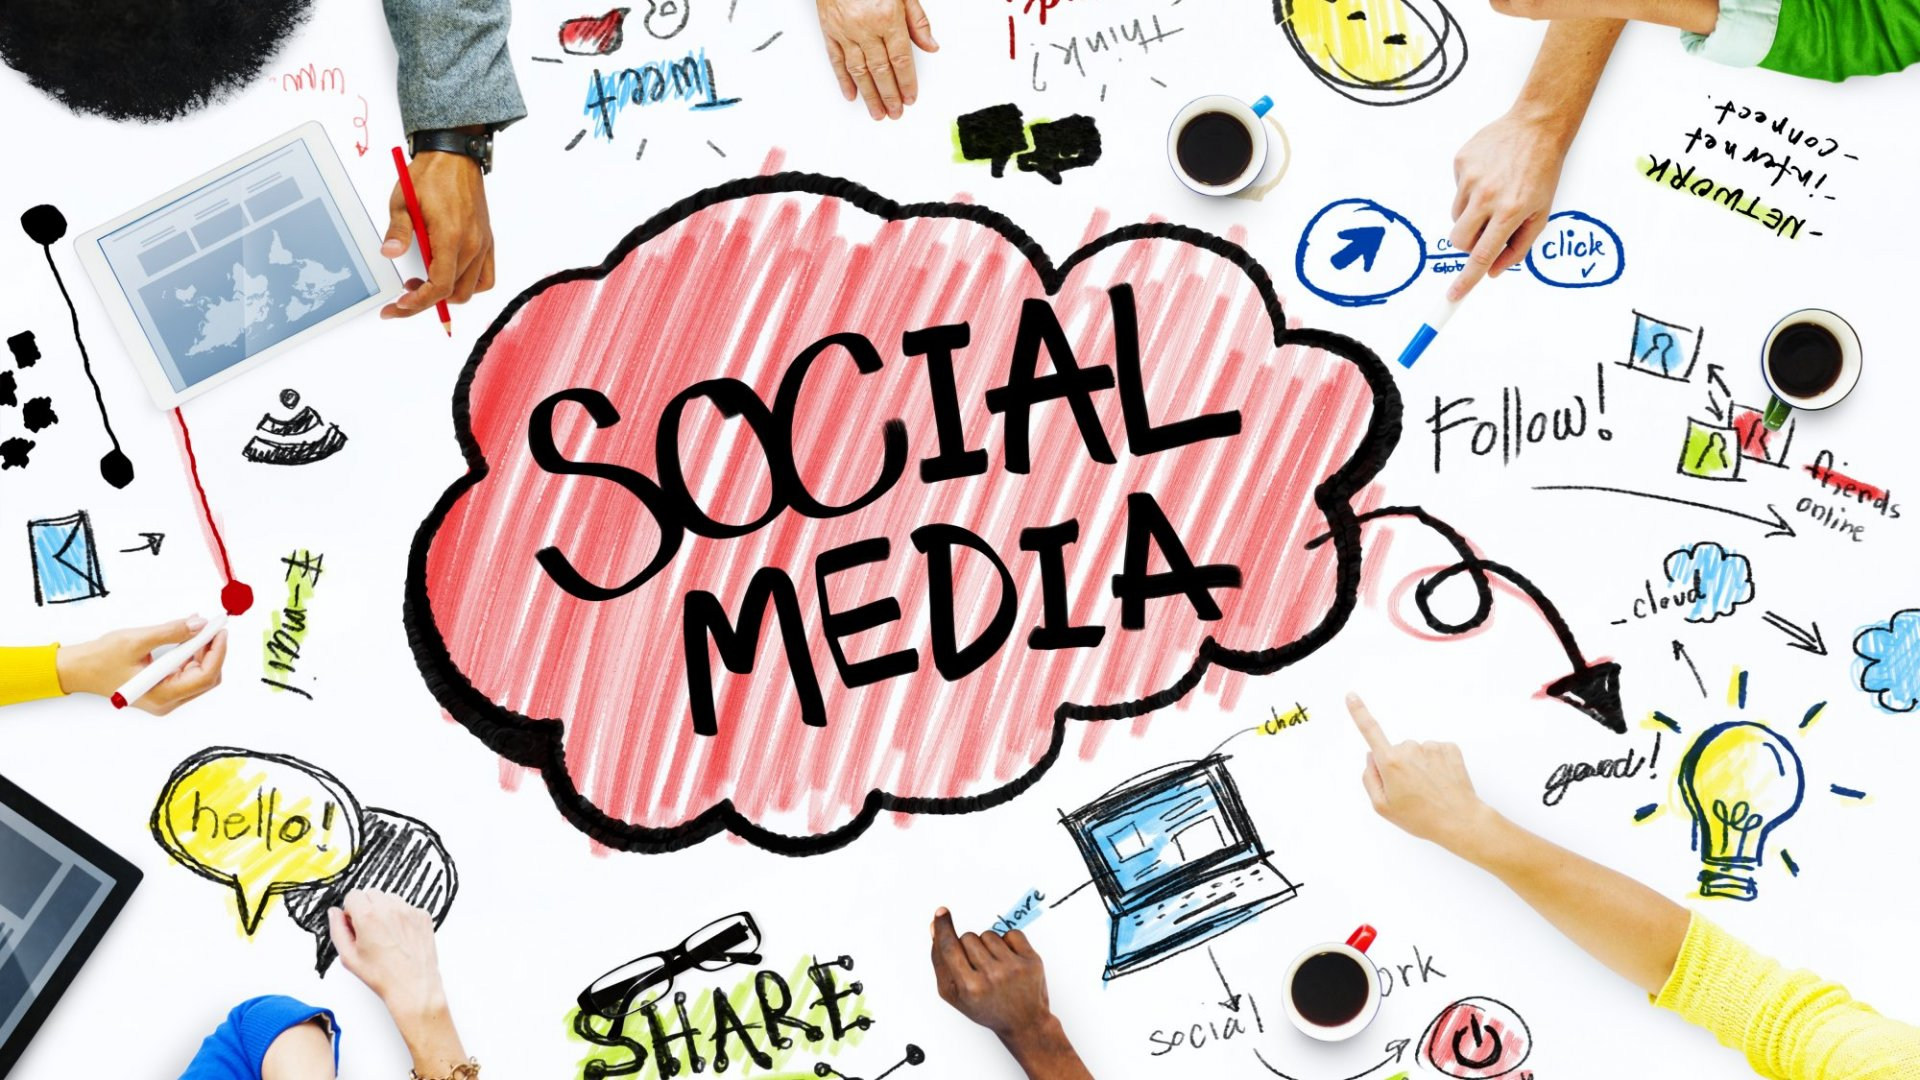 Facebook's 5 Social Media Marketing Ideas for the 2016 Holiday Season